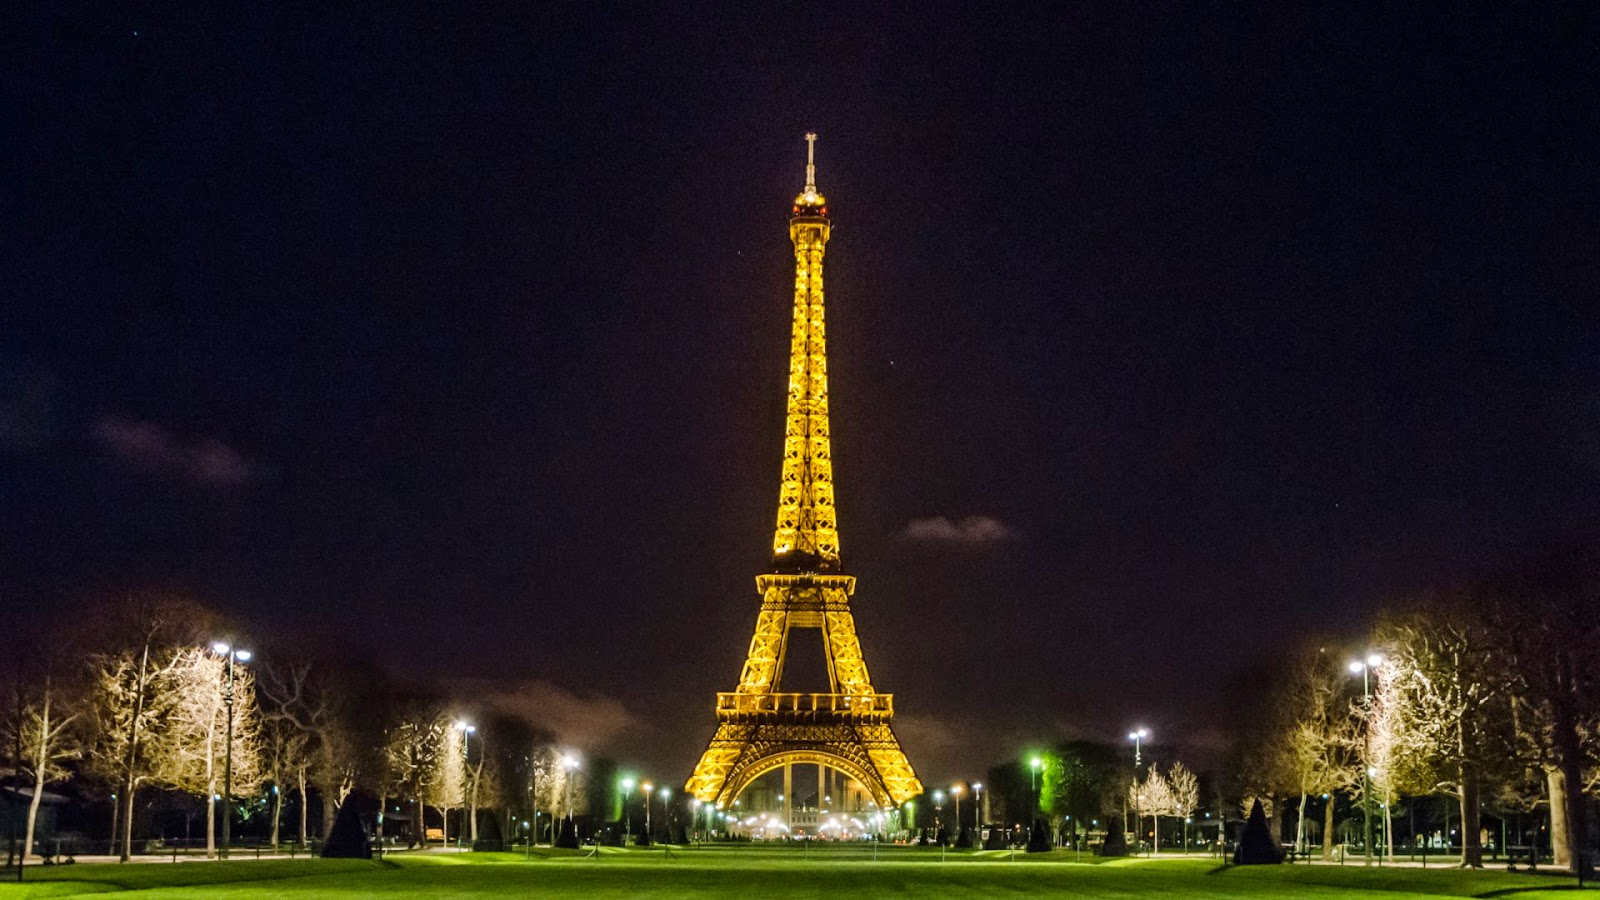 Eiffel Tower Night Desktop Backgrounds - Eiffel Tower ...